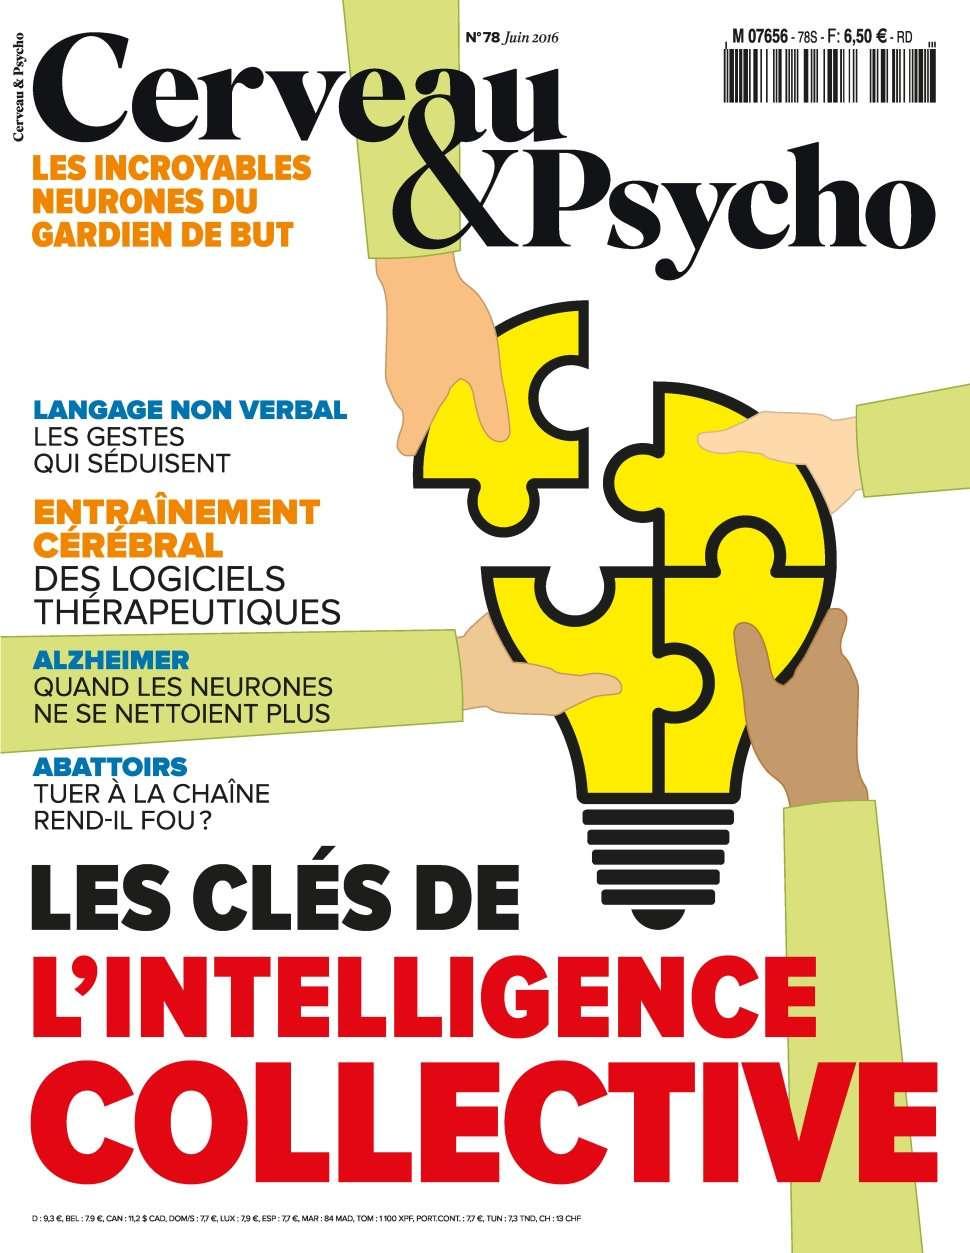 Cerveau & Psycho 78 - Juin 2016